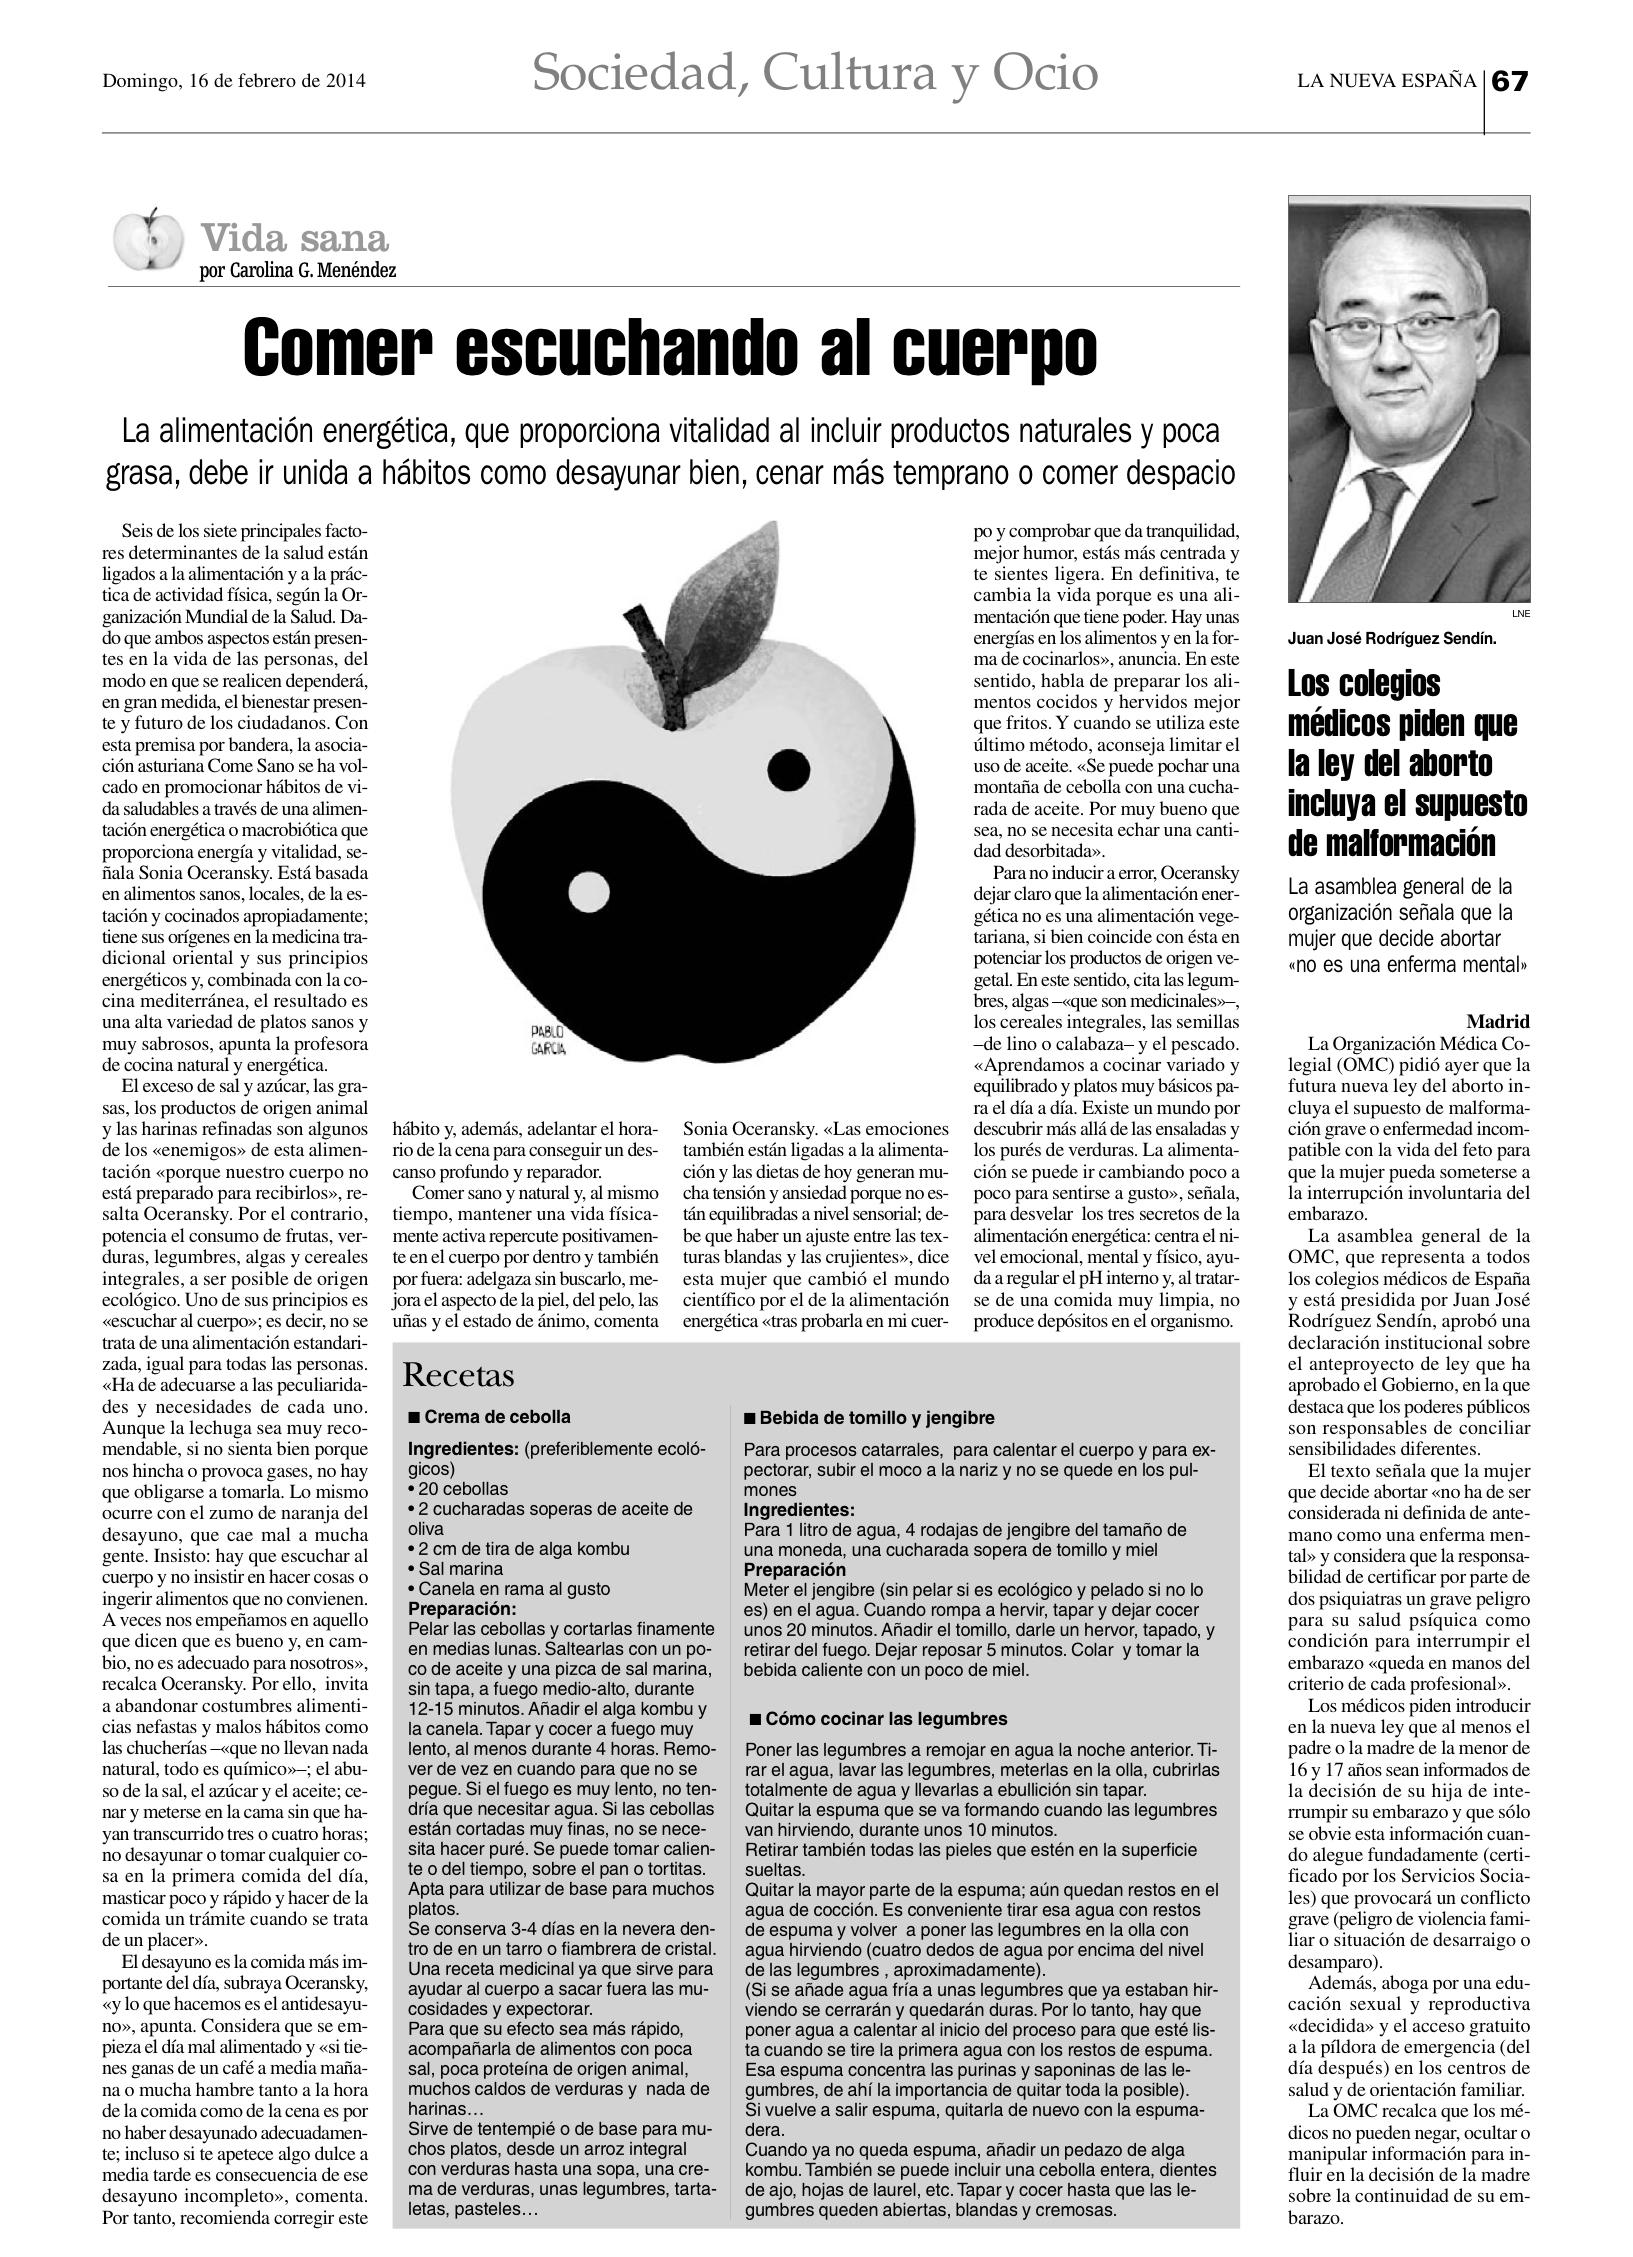 Entrevista Sonia Oceransky LNE 26 febrero 2014